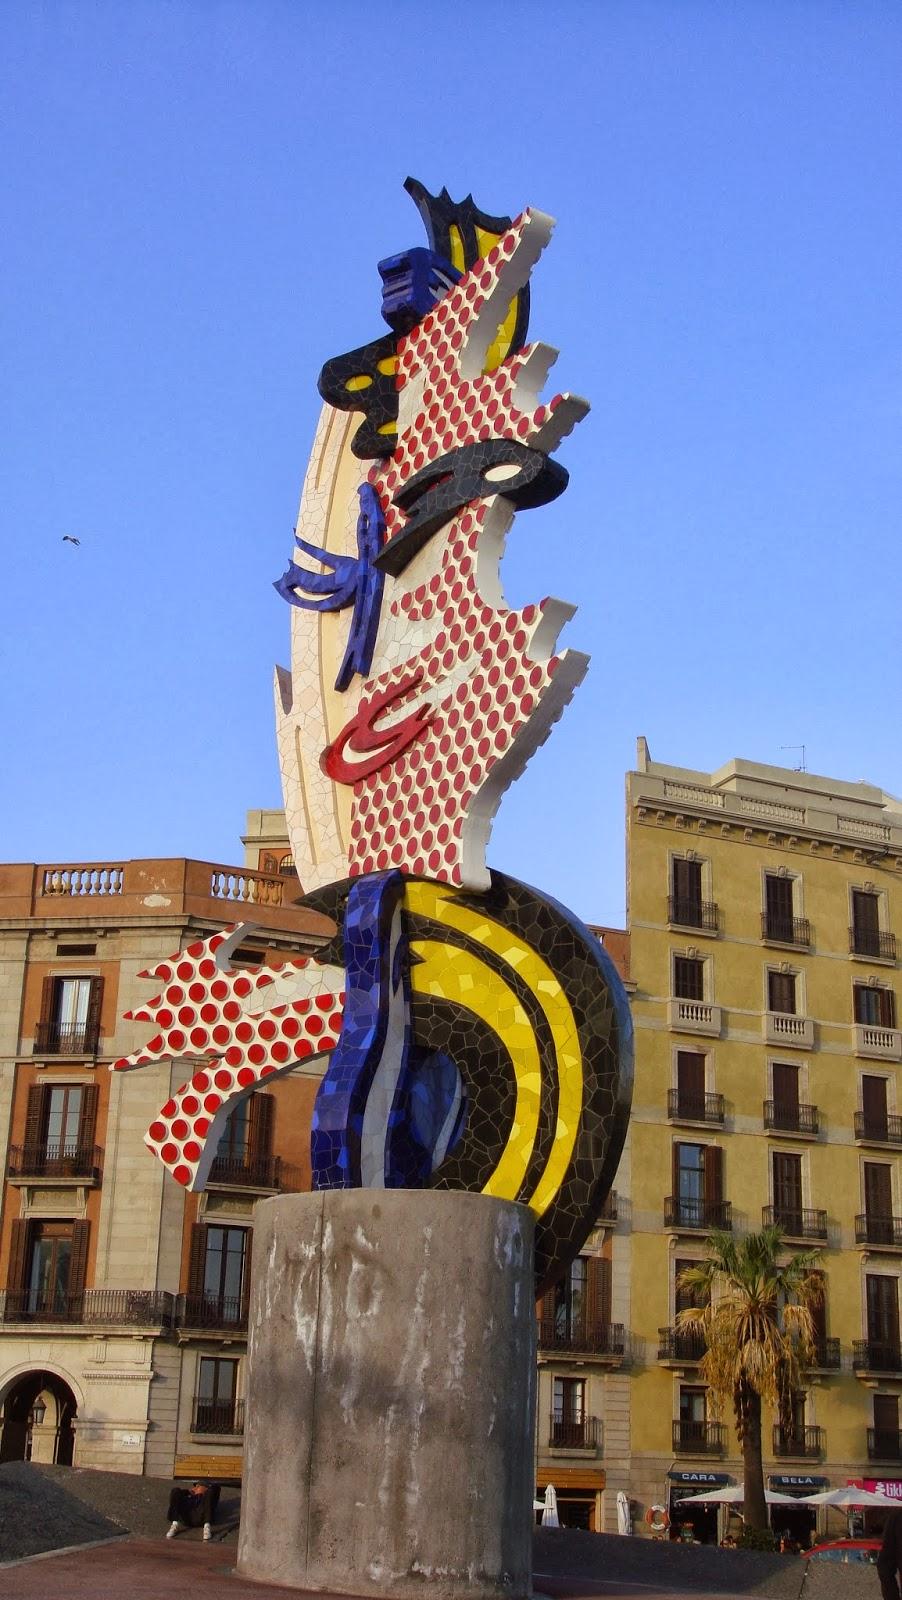 Esculturas, Port Vell, Barcelona, Elisa N, Blog de Viajes, Lifestyle, Travel